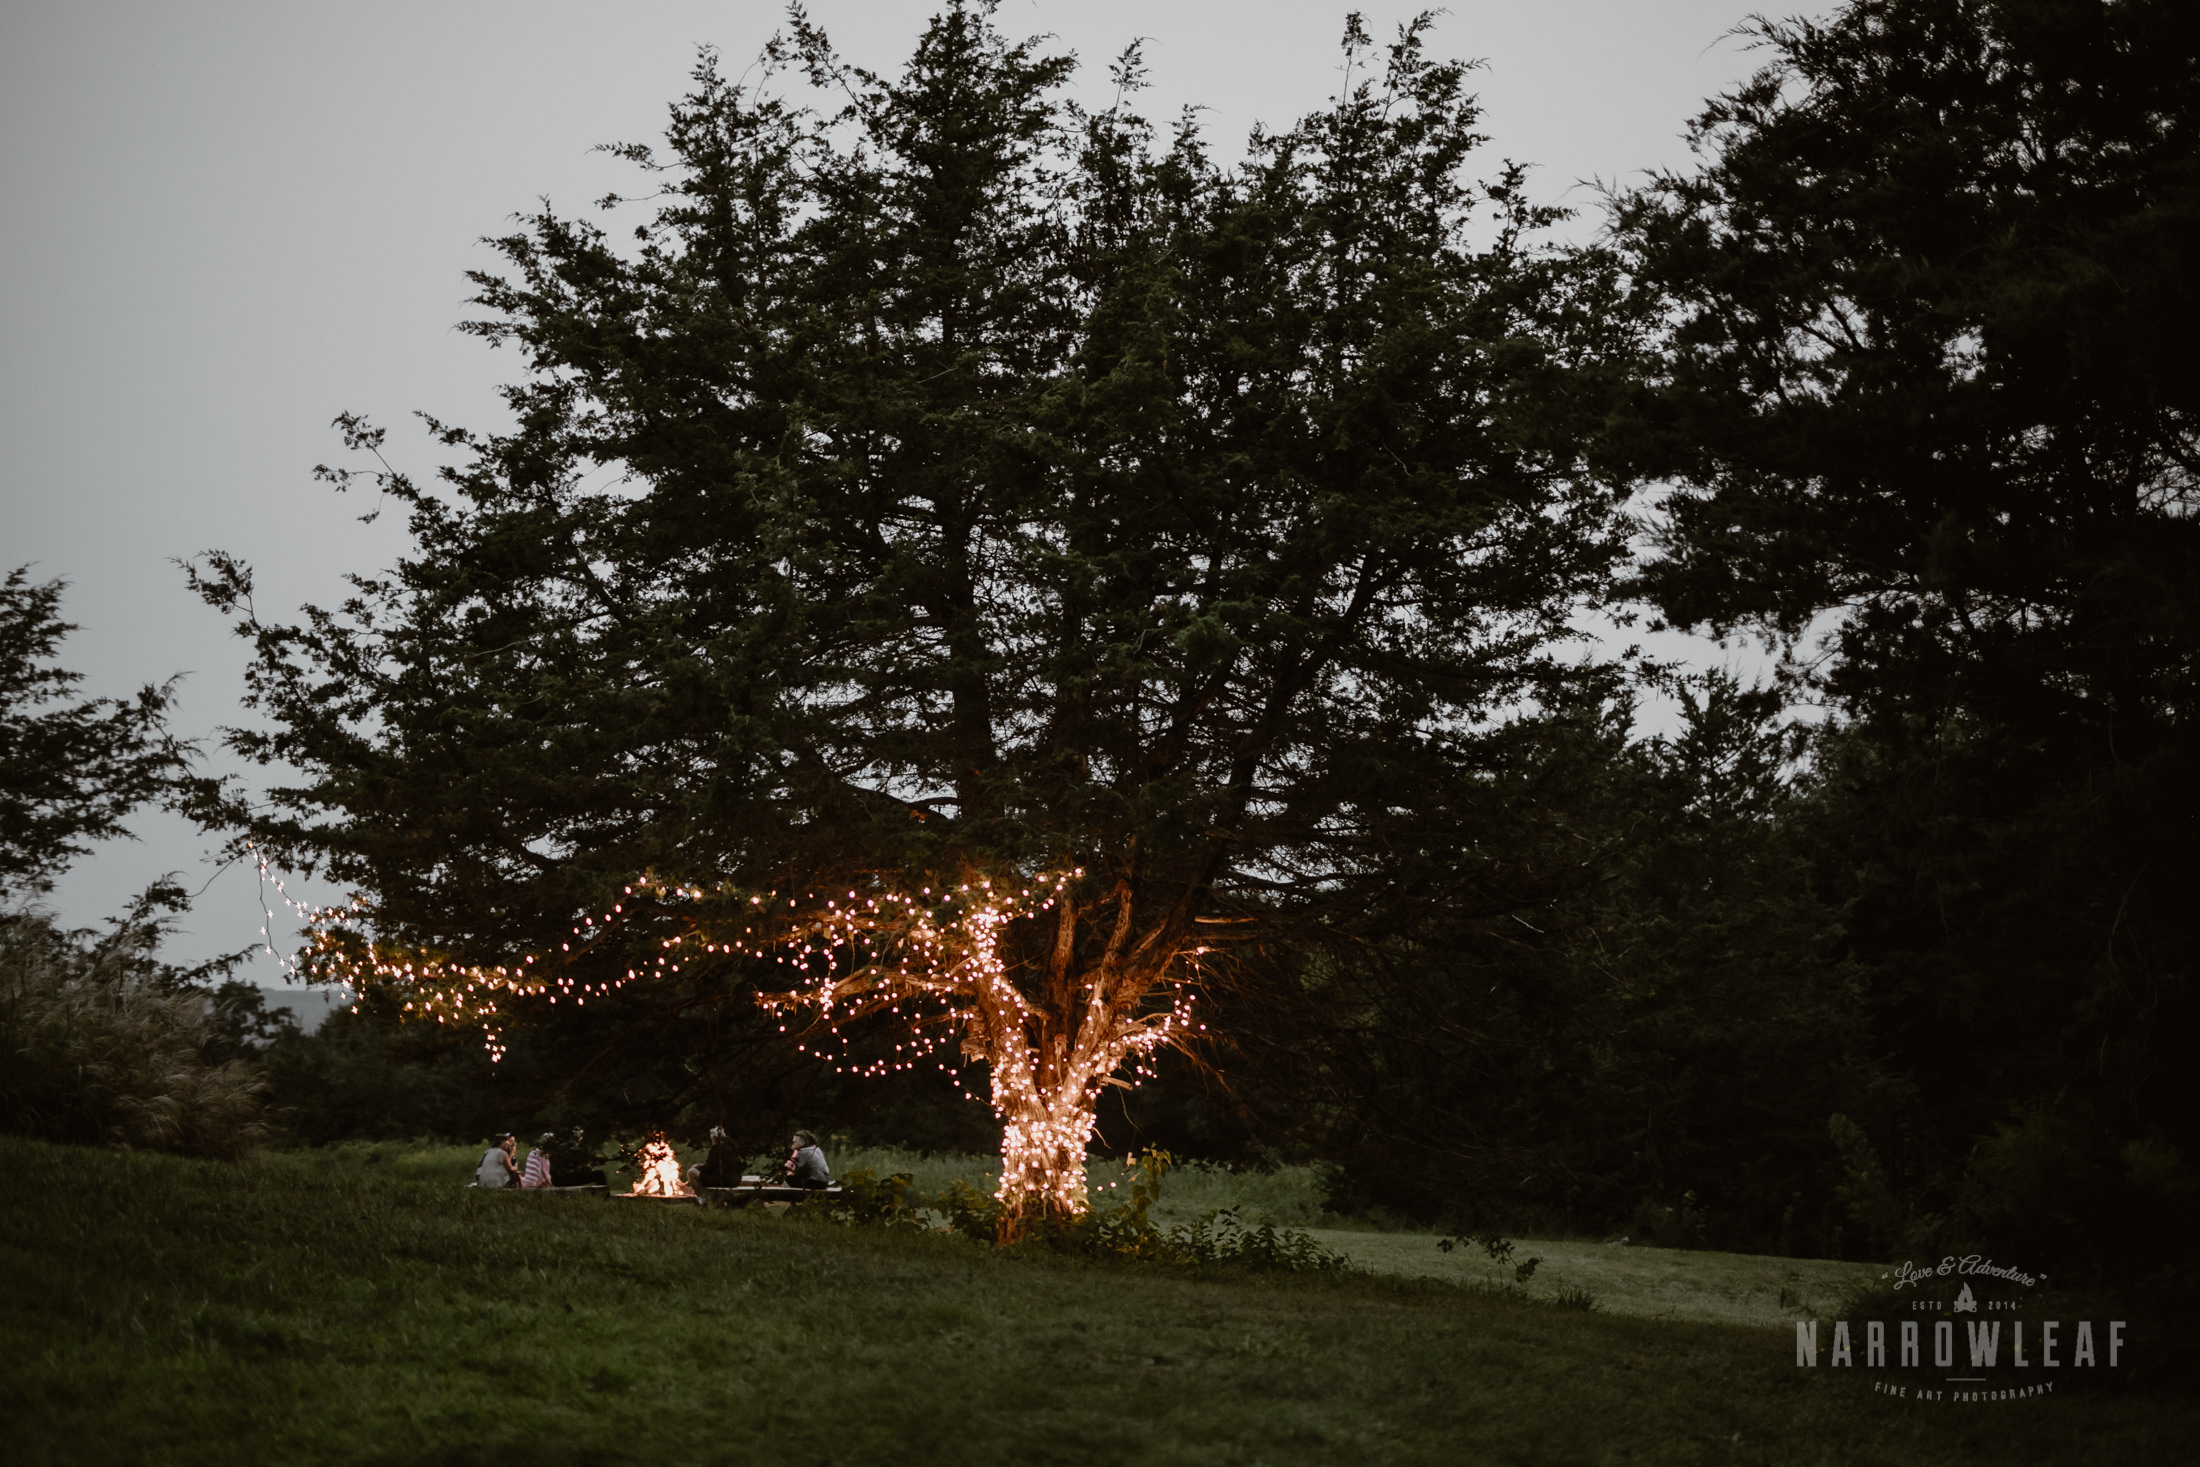 wisconsin-wedding-photographer-Narrowleaf_Love_and_Adventure_Photography-4102.jpg